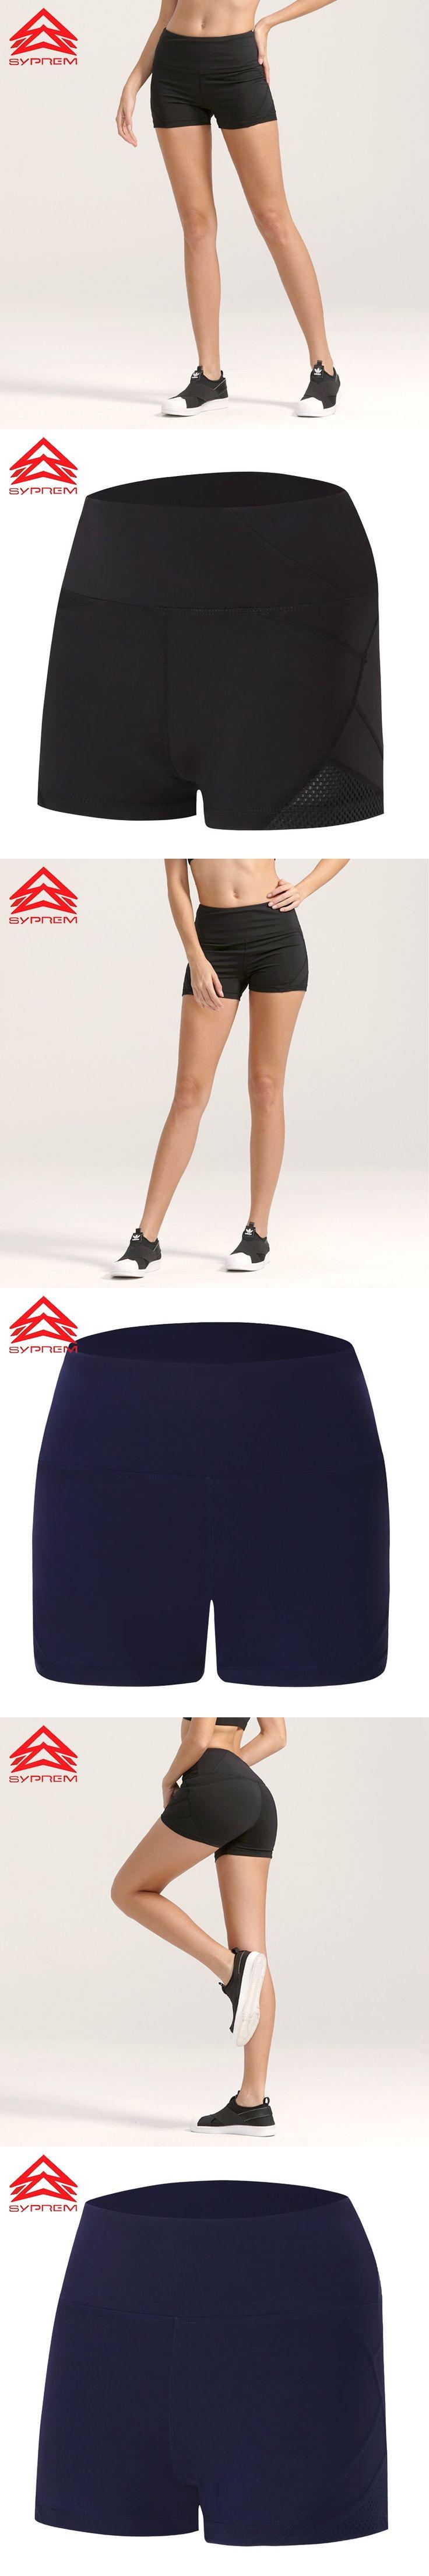 Syprem Dry-Fit Women Slim Mesh Design Sportswear Girls Dancing Shorts Running Shorts Sports Breathable Black,1FP0024